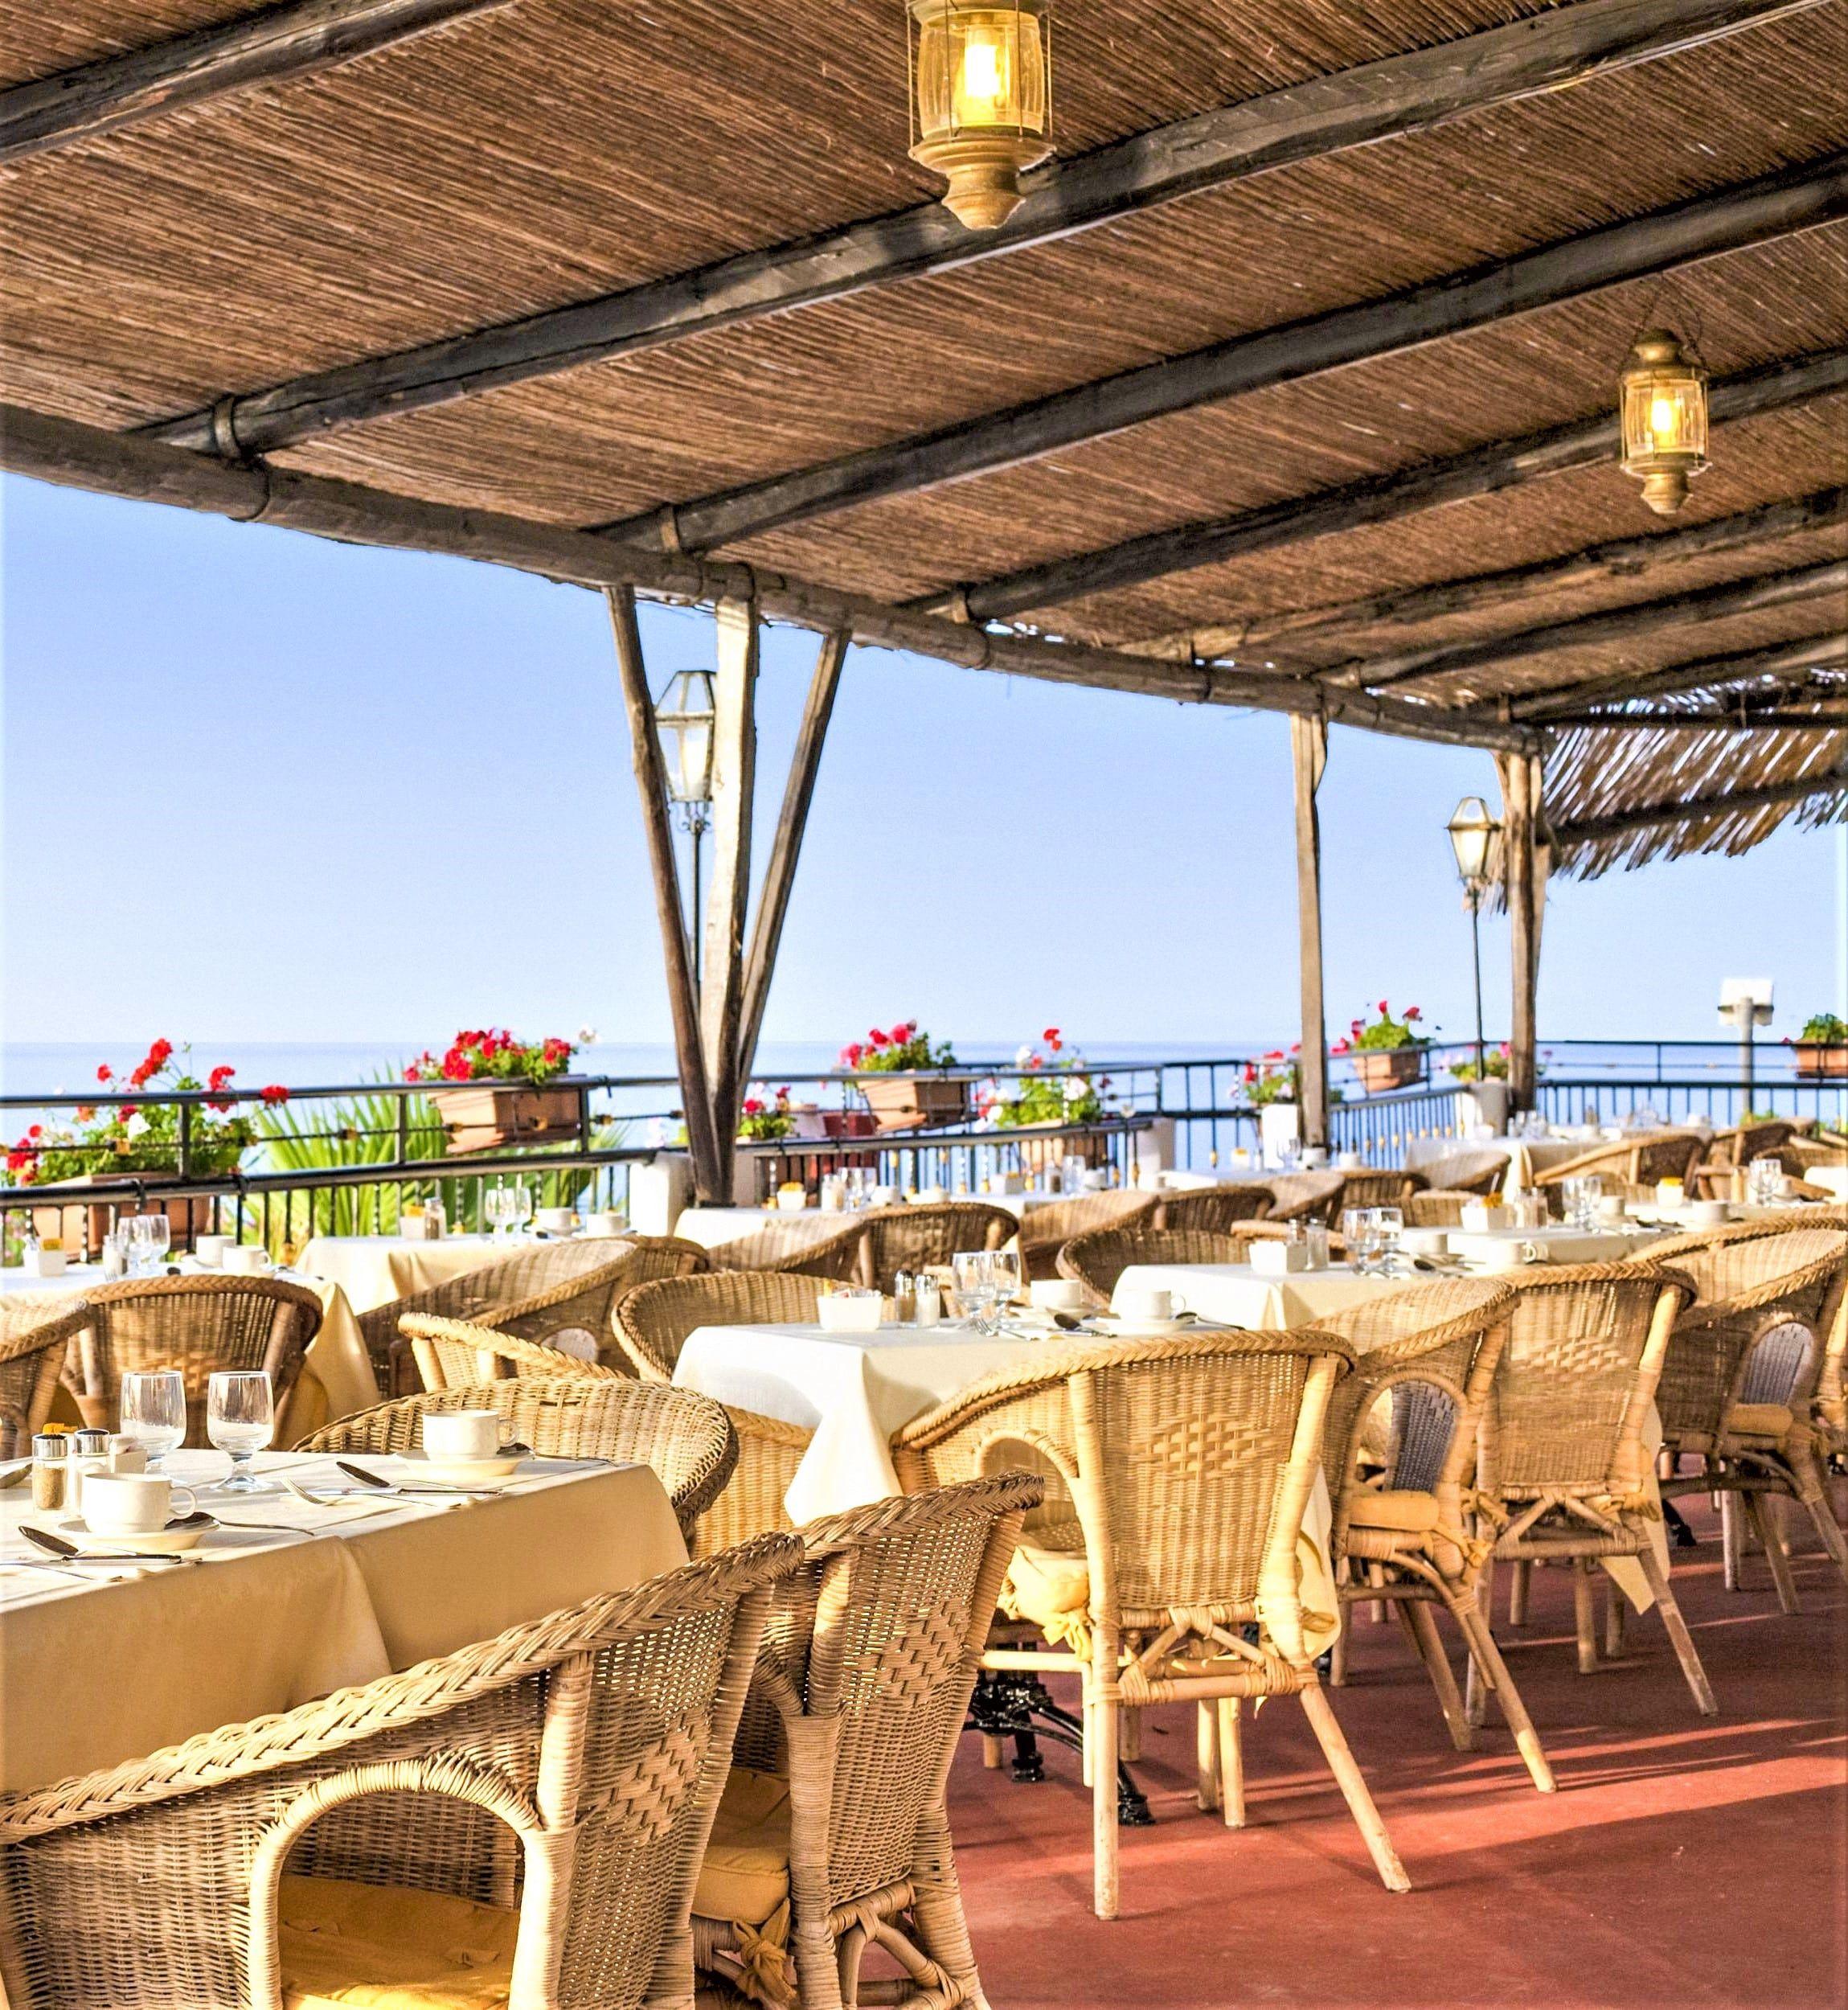 Italien Urlaub In Italien Hotel Tipps Fur Itlaien Hilton Giardini